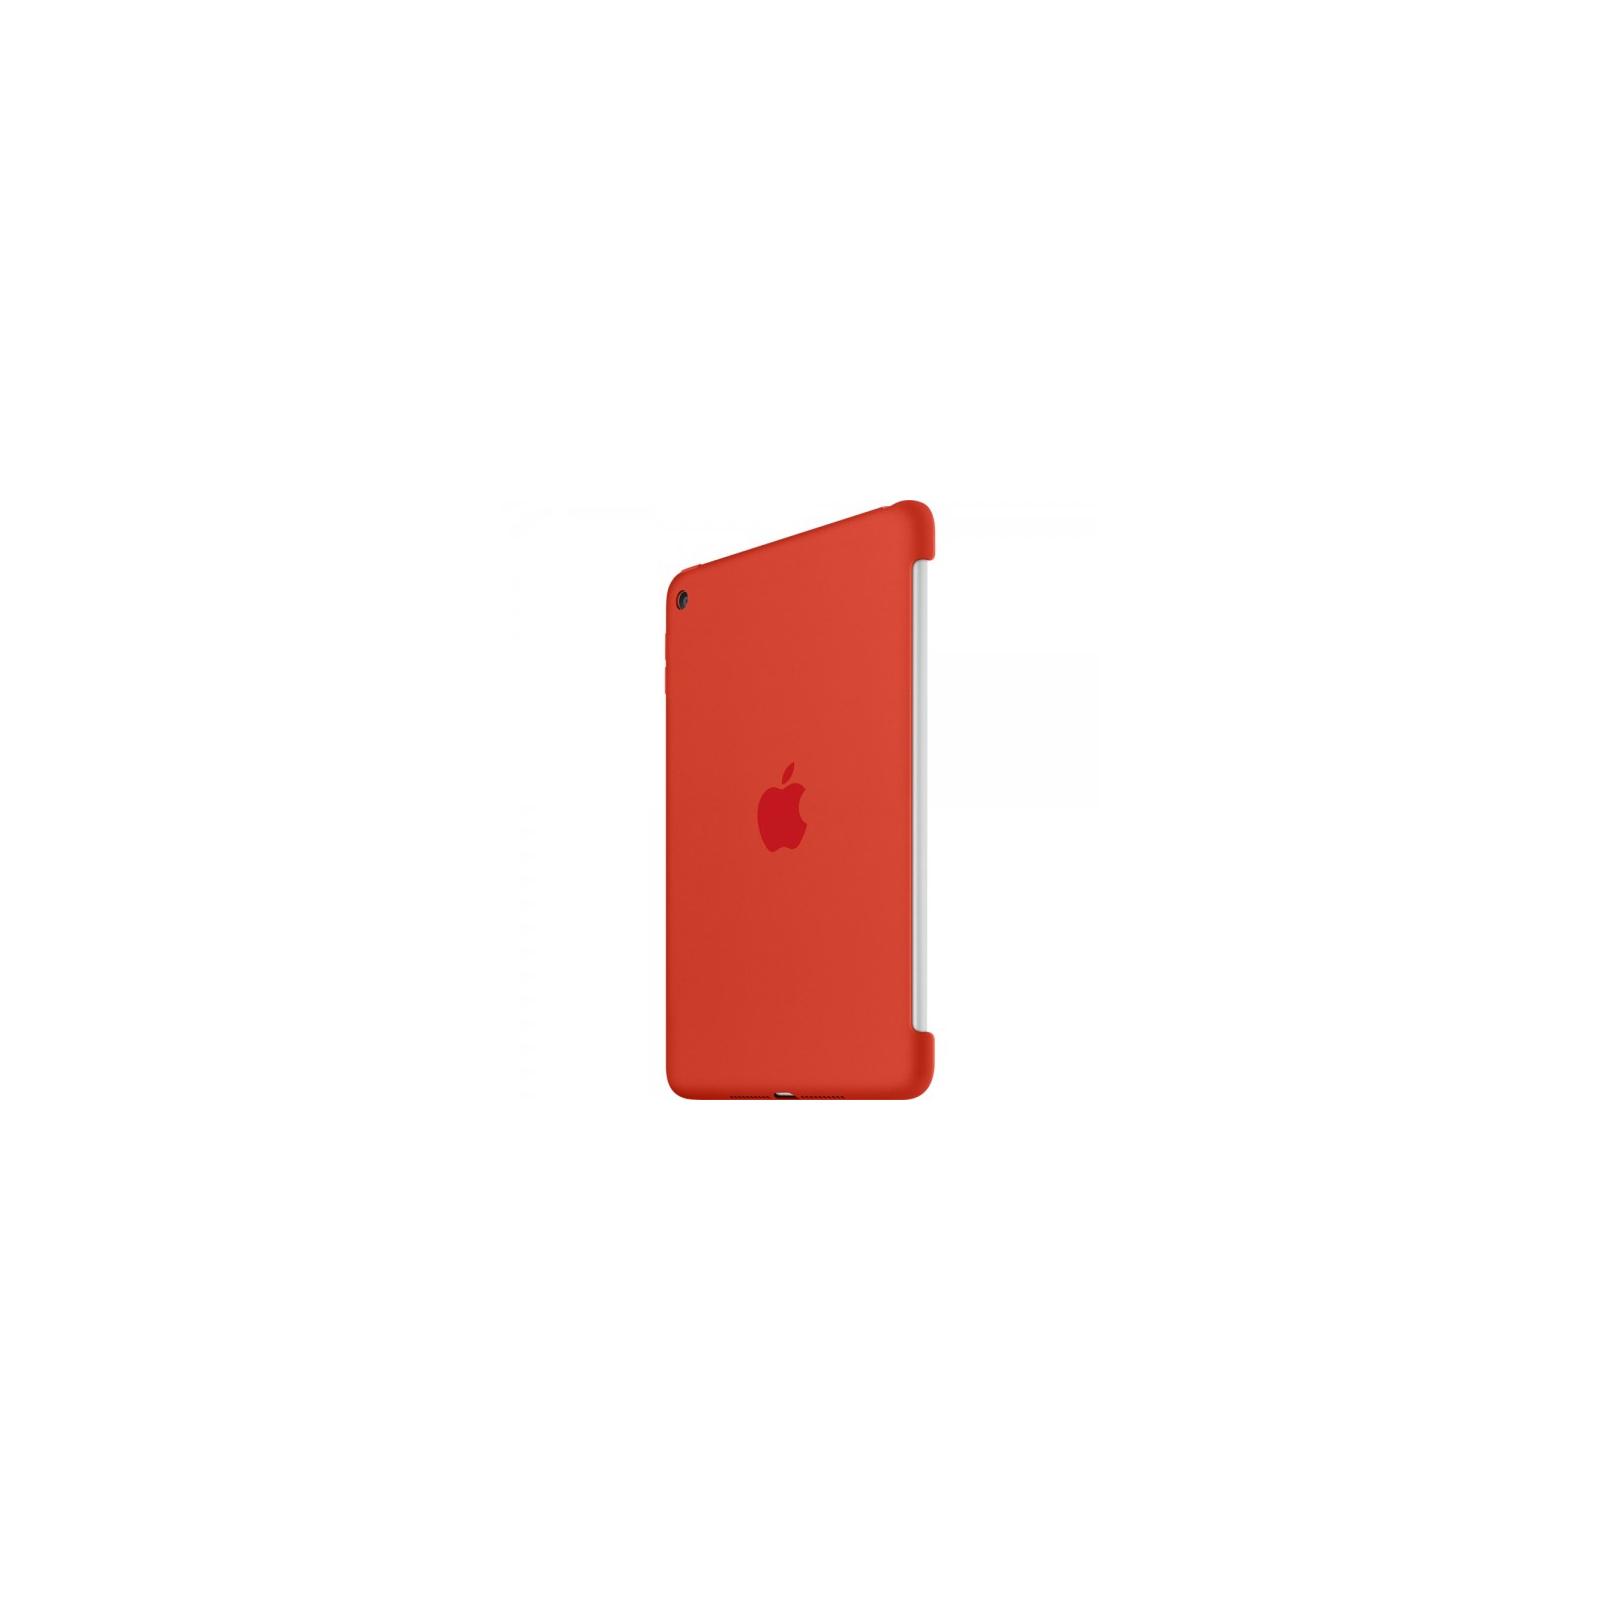 Чехол для планшета Apple iPad mini 4 Orange (MLD42ZM/A) изображение 2